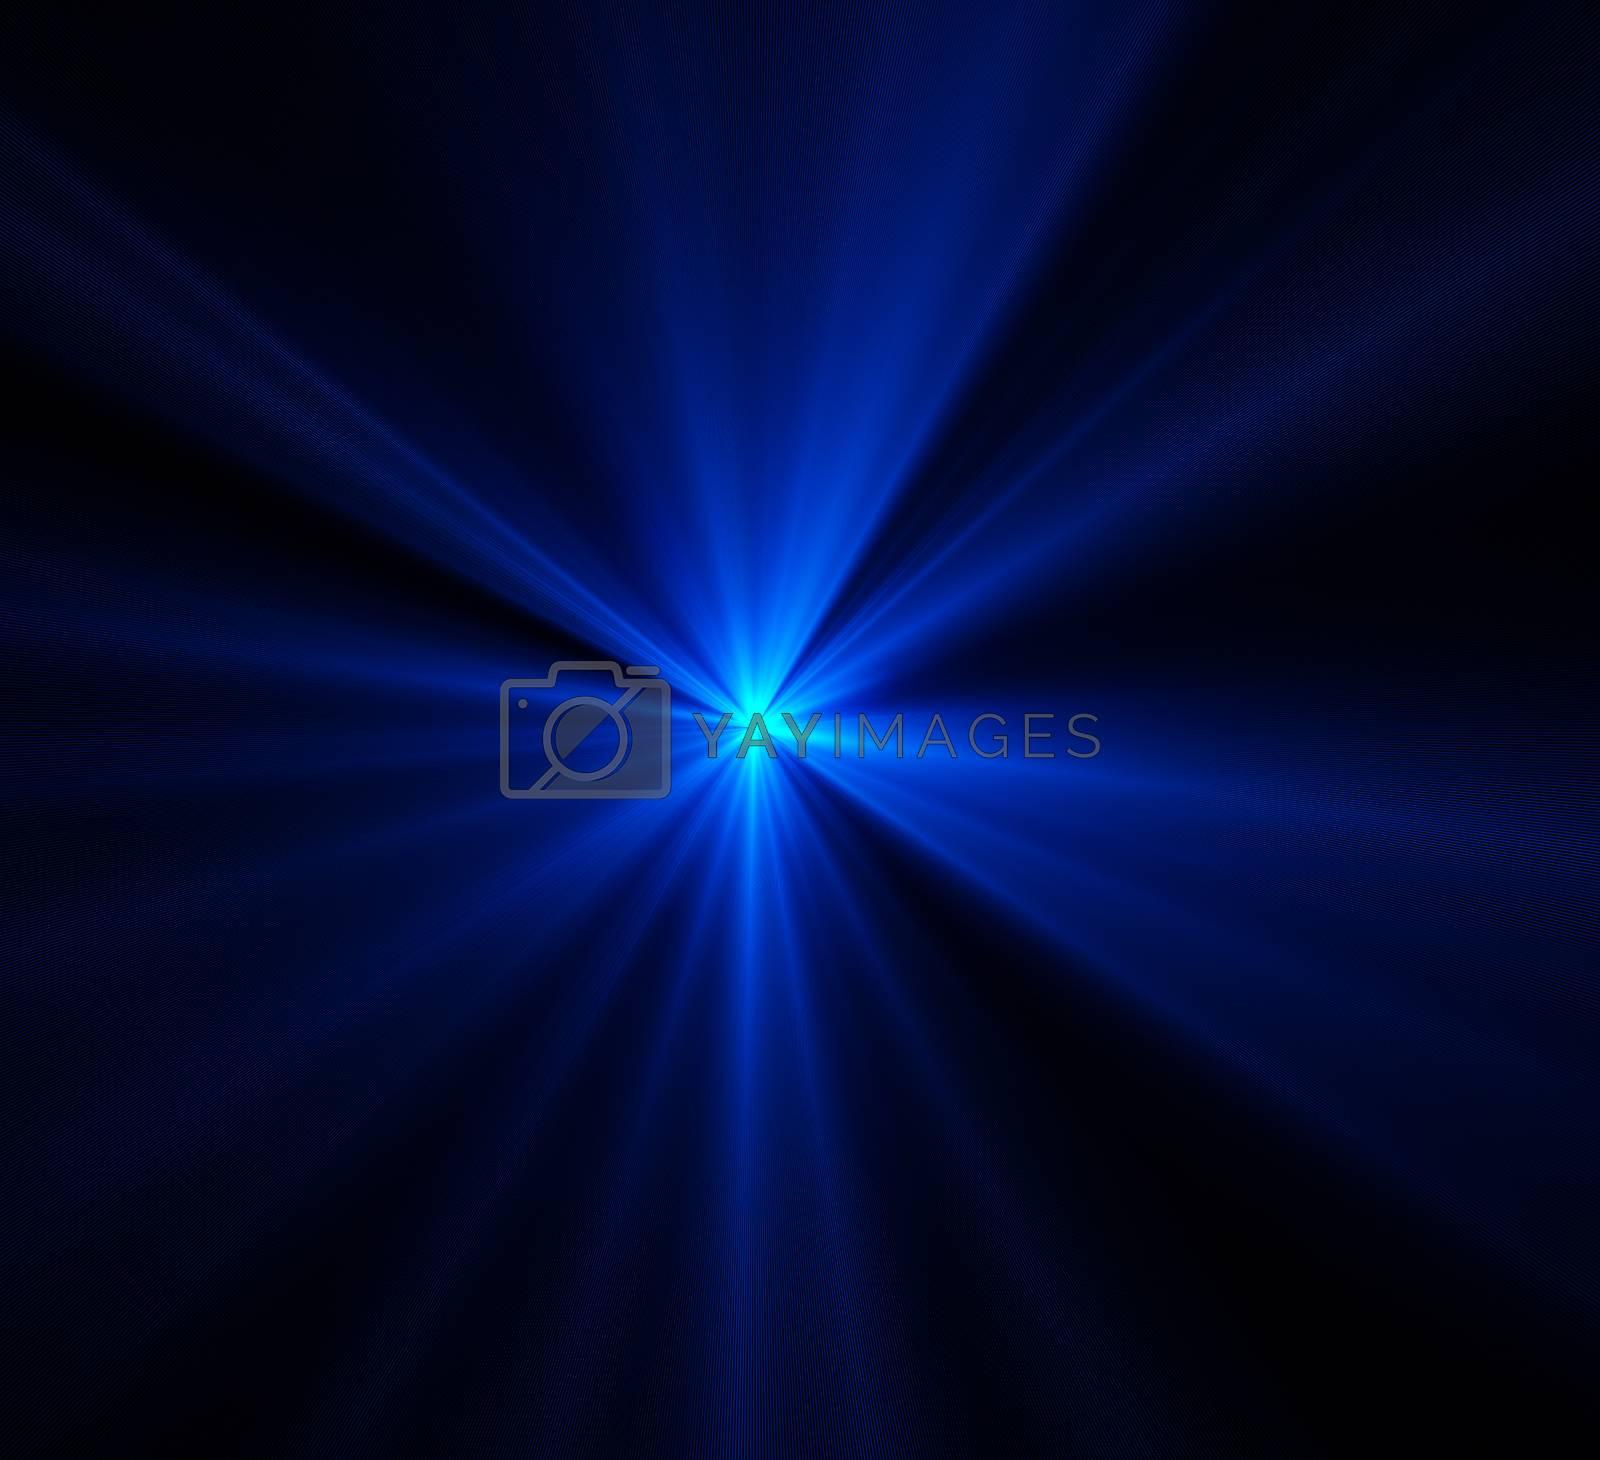 lighting against a dark background